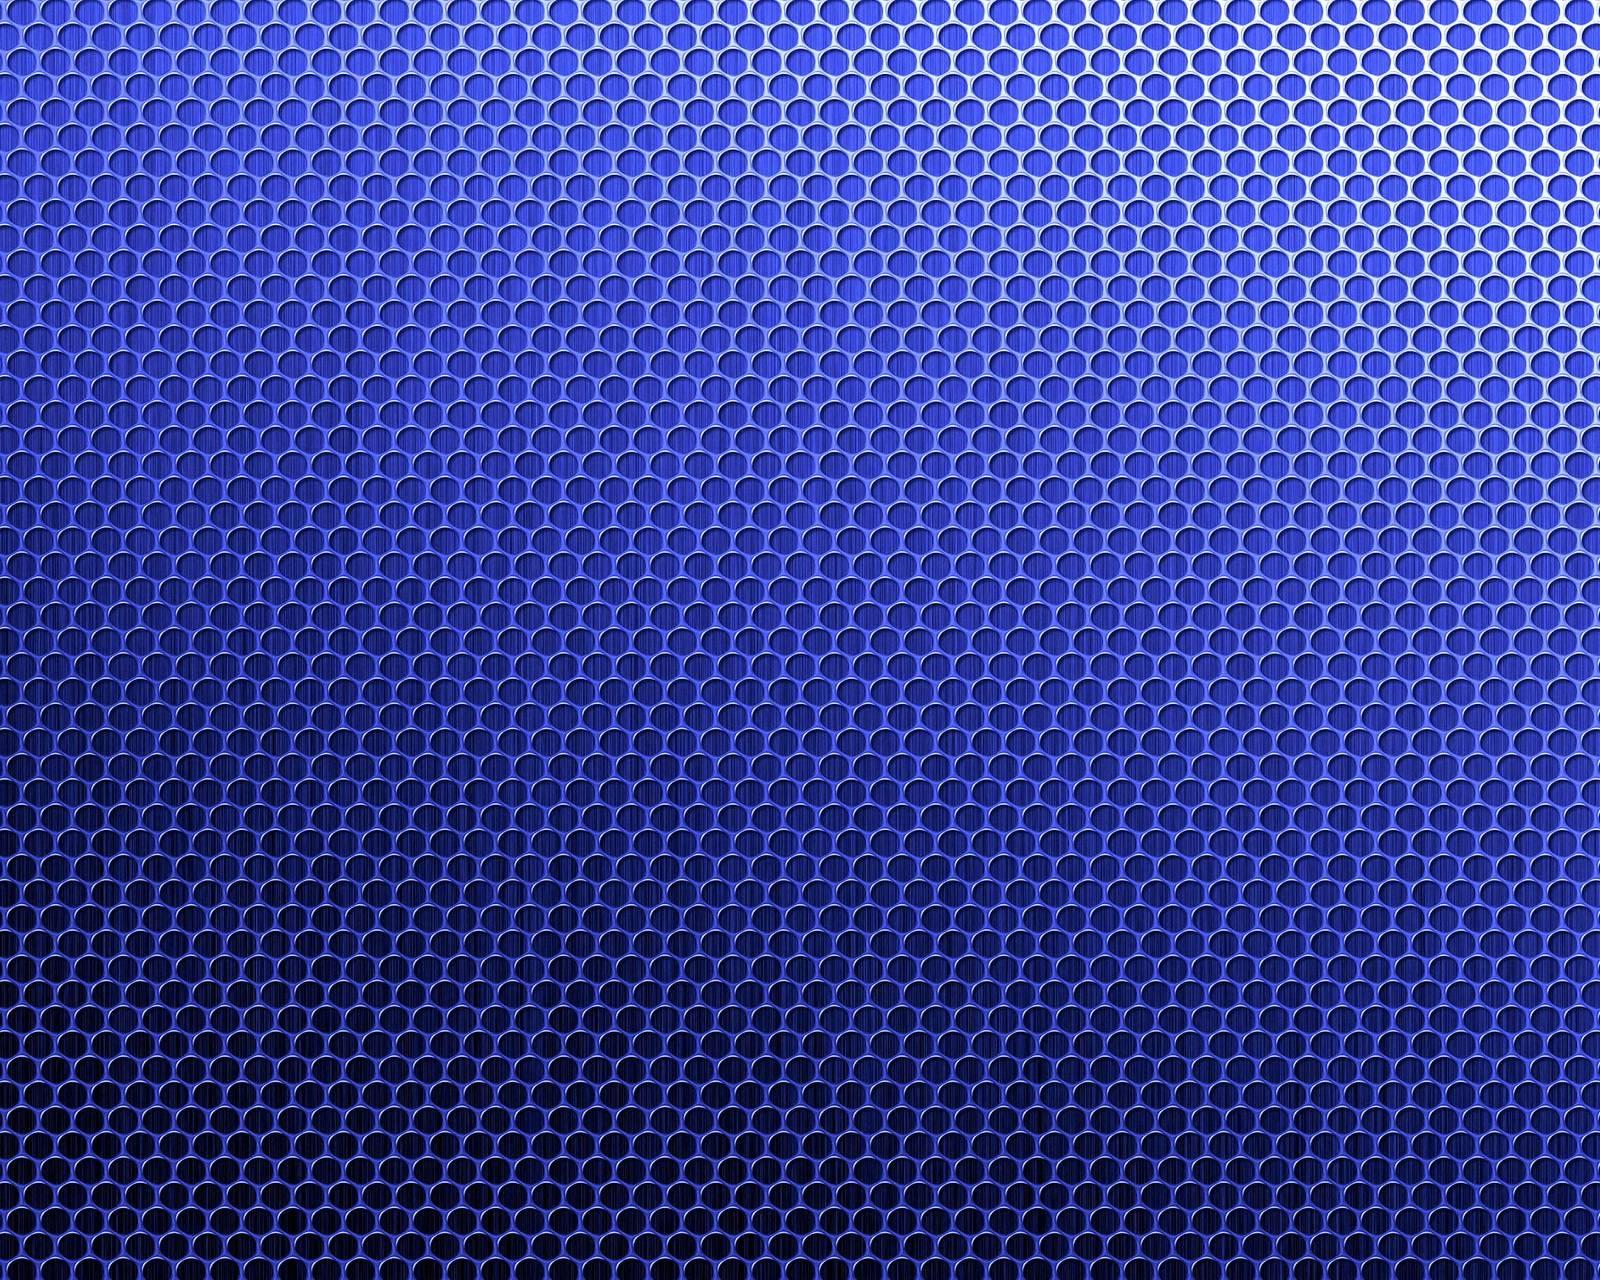 Blue Mesh Pattern